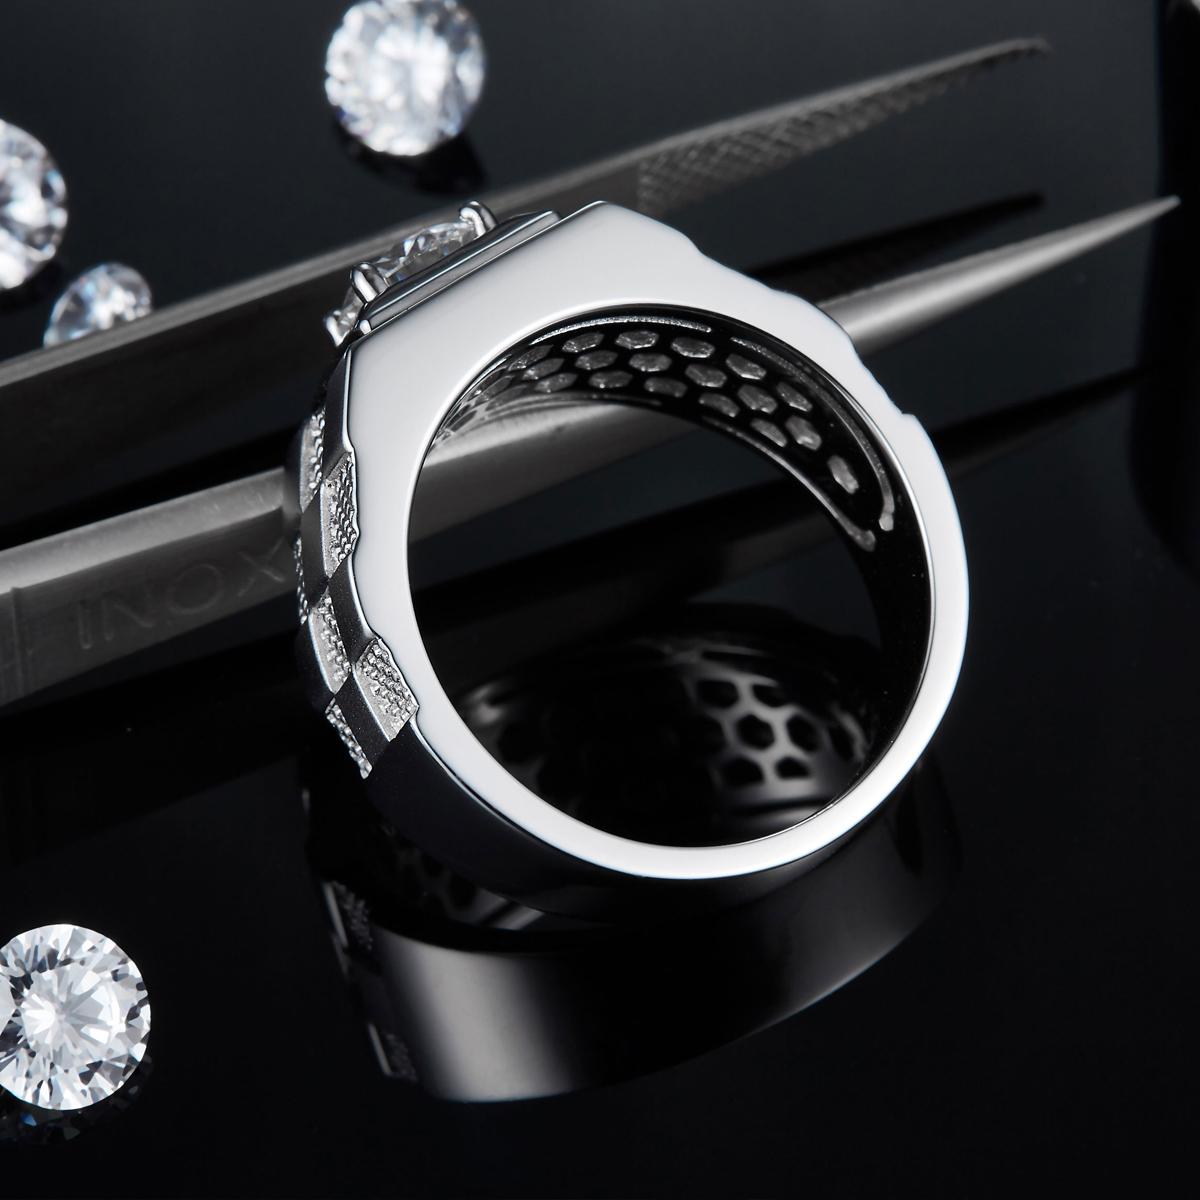 Мужское кольцо с муассанитом 65 карата мм